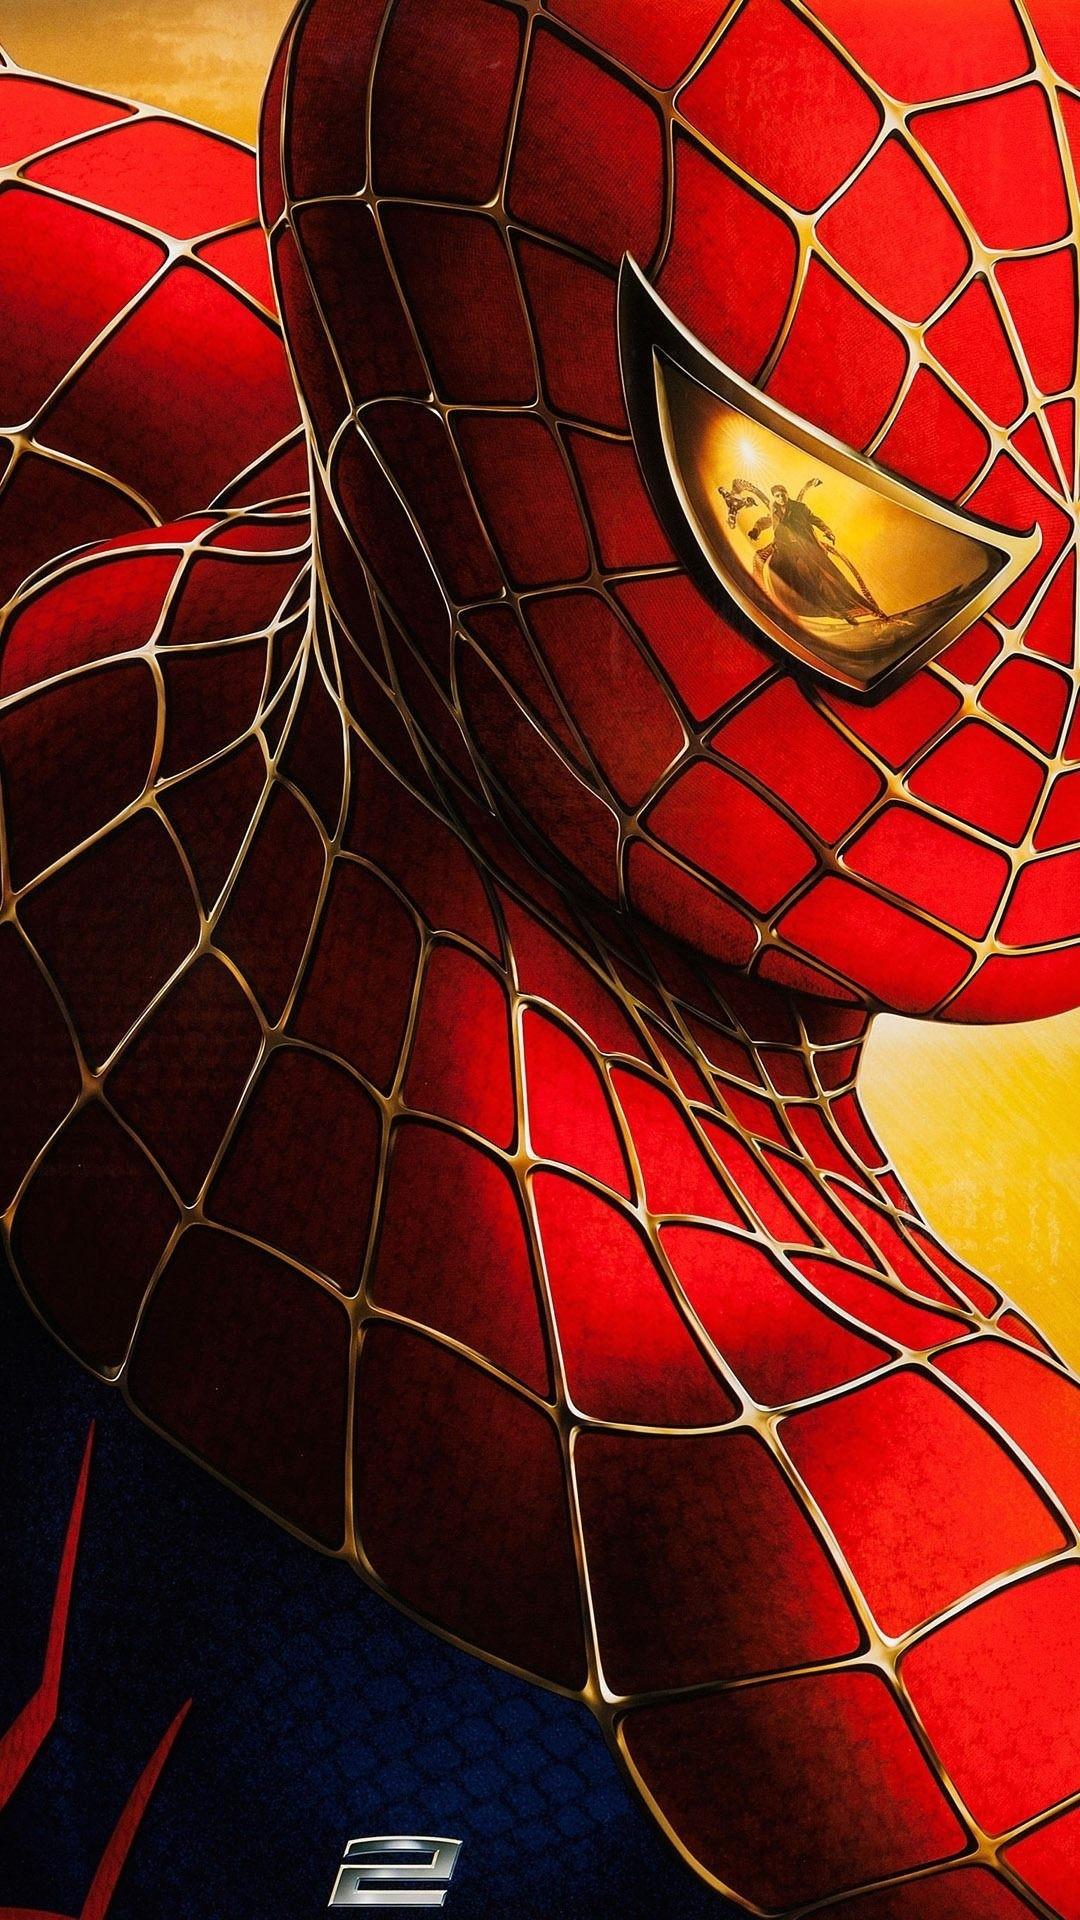 Gallery of Spiderman Wallpaper Iphone 8211  Entertainmentspiderman2iphone6pluswallpapers  Moviespidermaiphone6pluswallpapers F06840